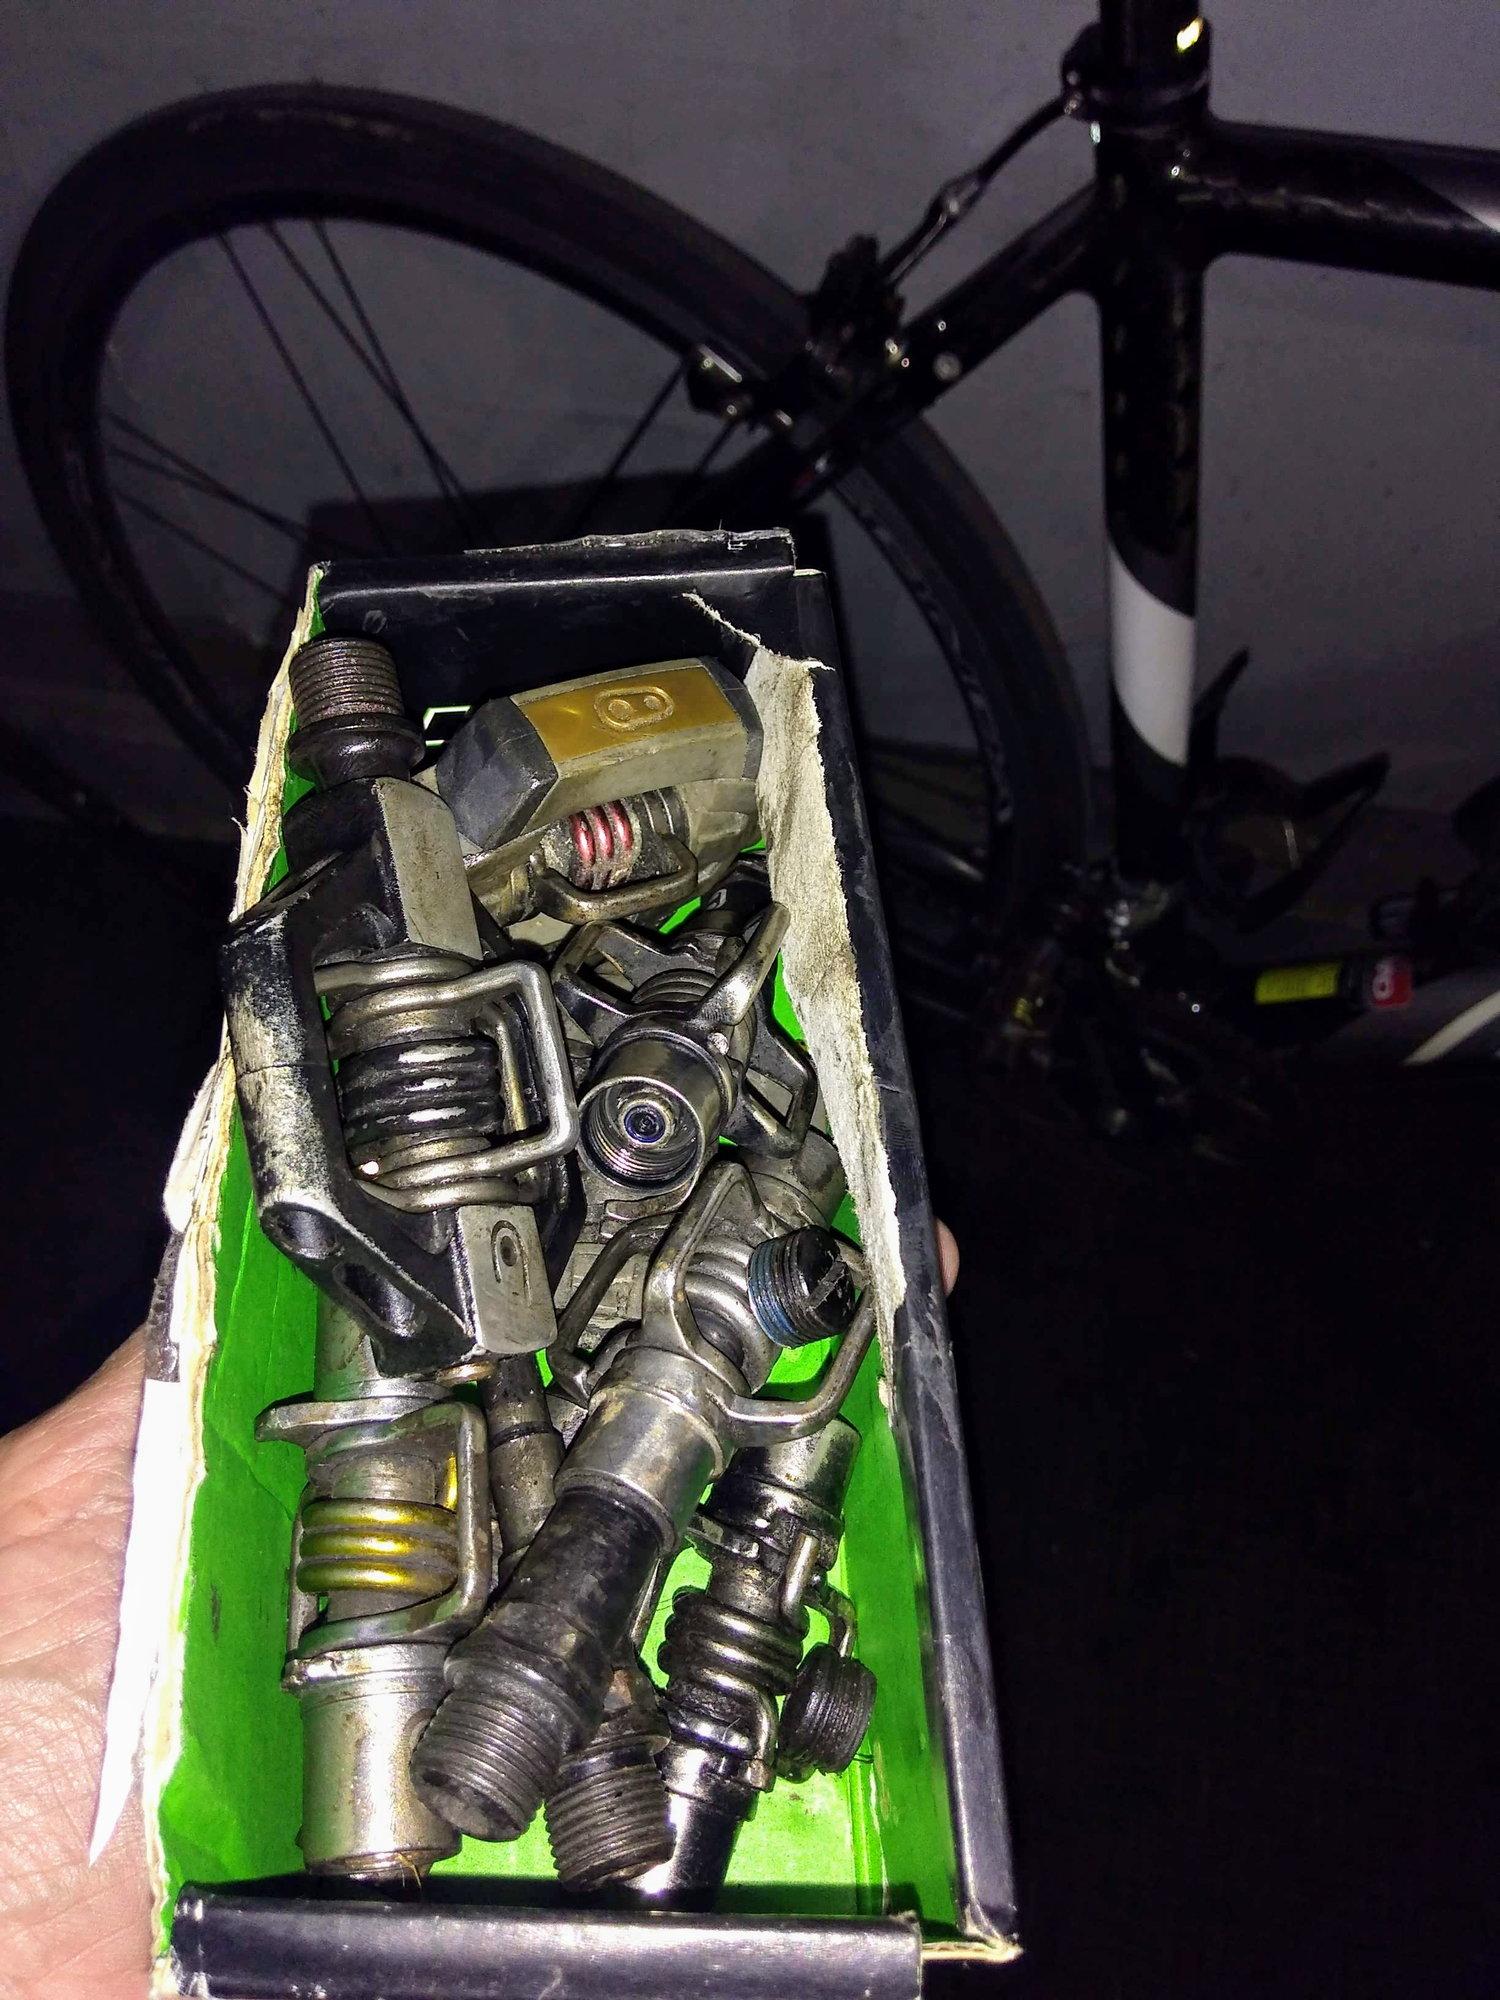 Crank Brothers Eggbeater Pedal Rebuild Kit for Original 02 Brand New